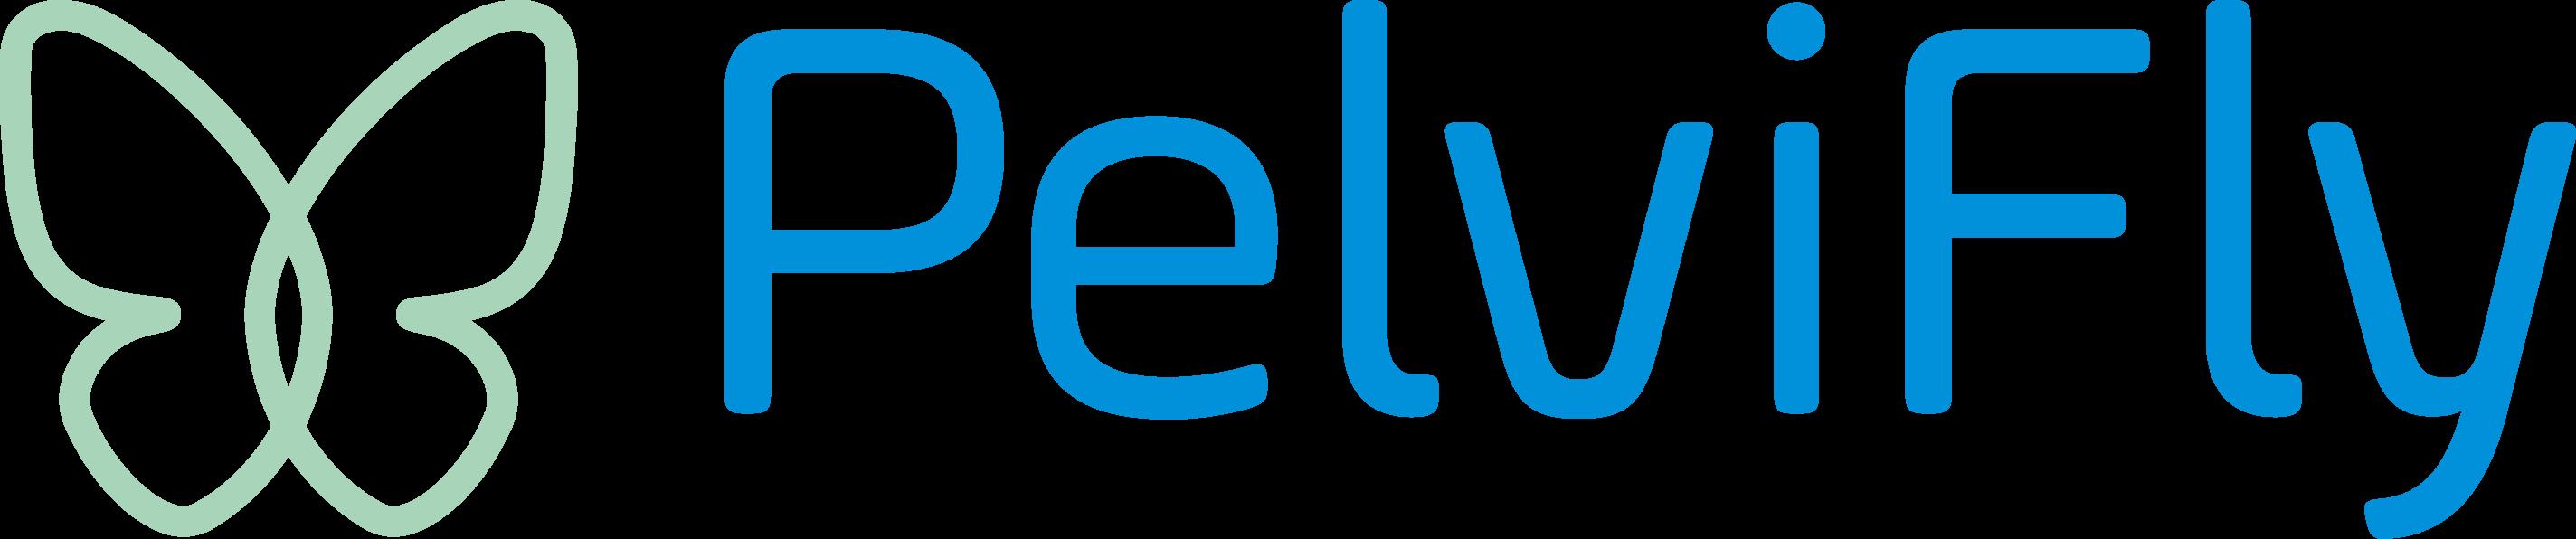 PelviFly logo transparent background